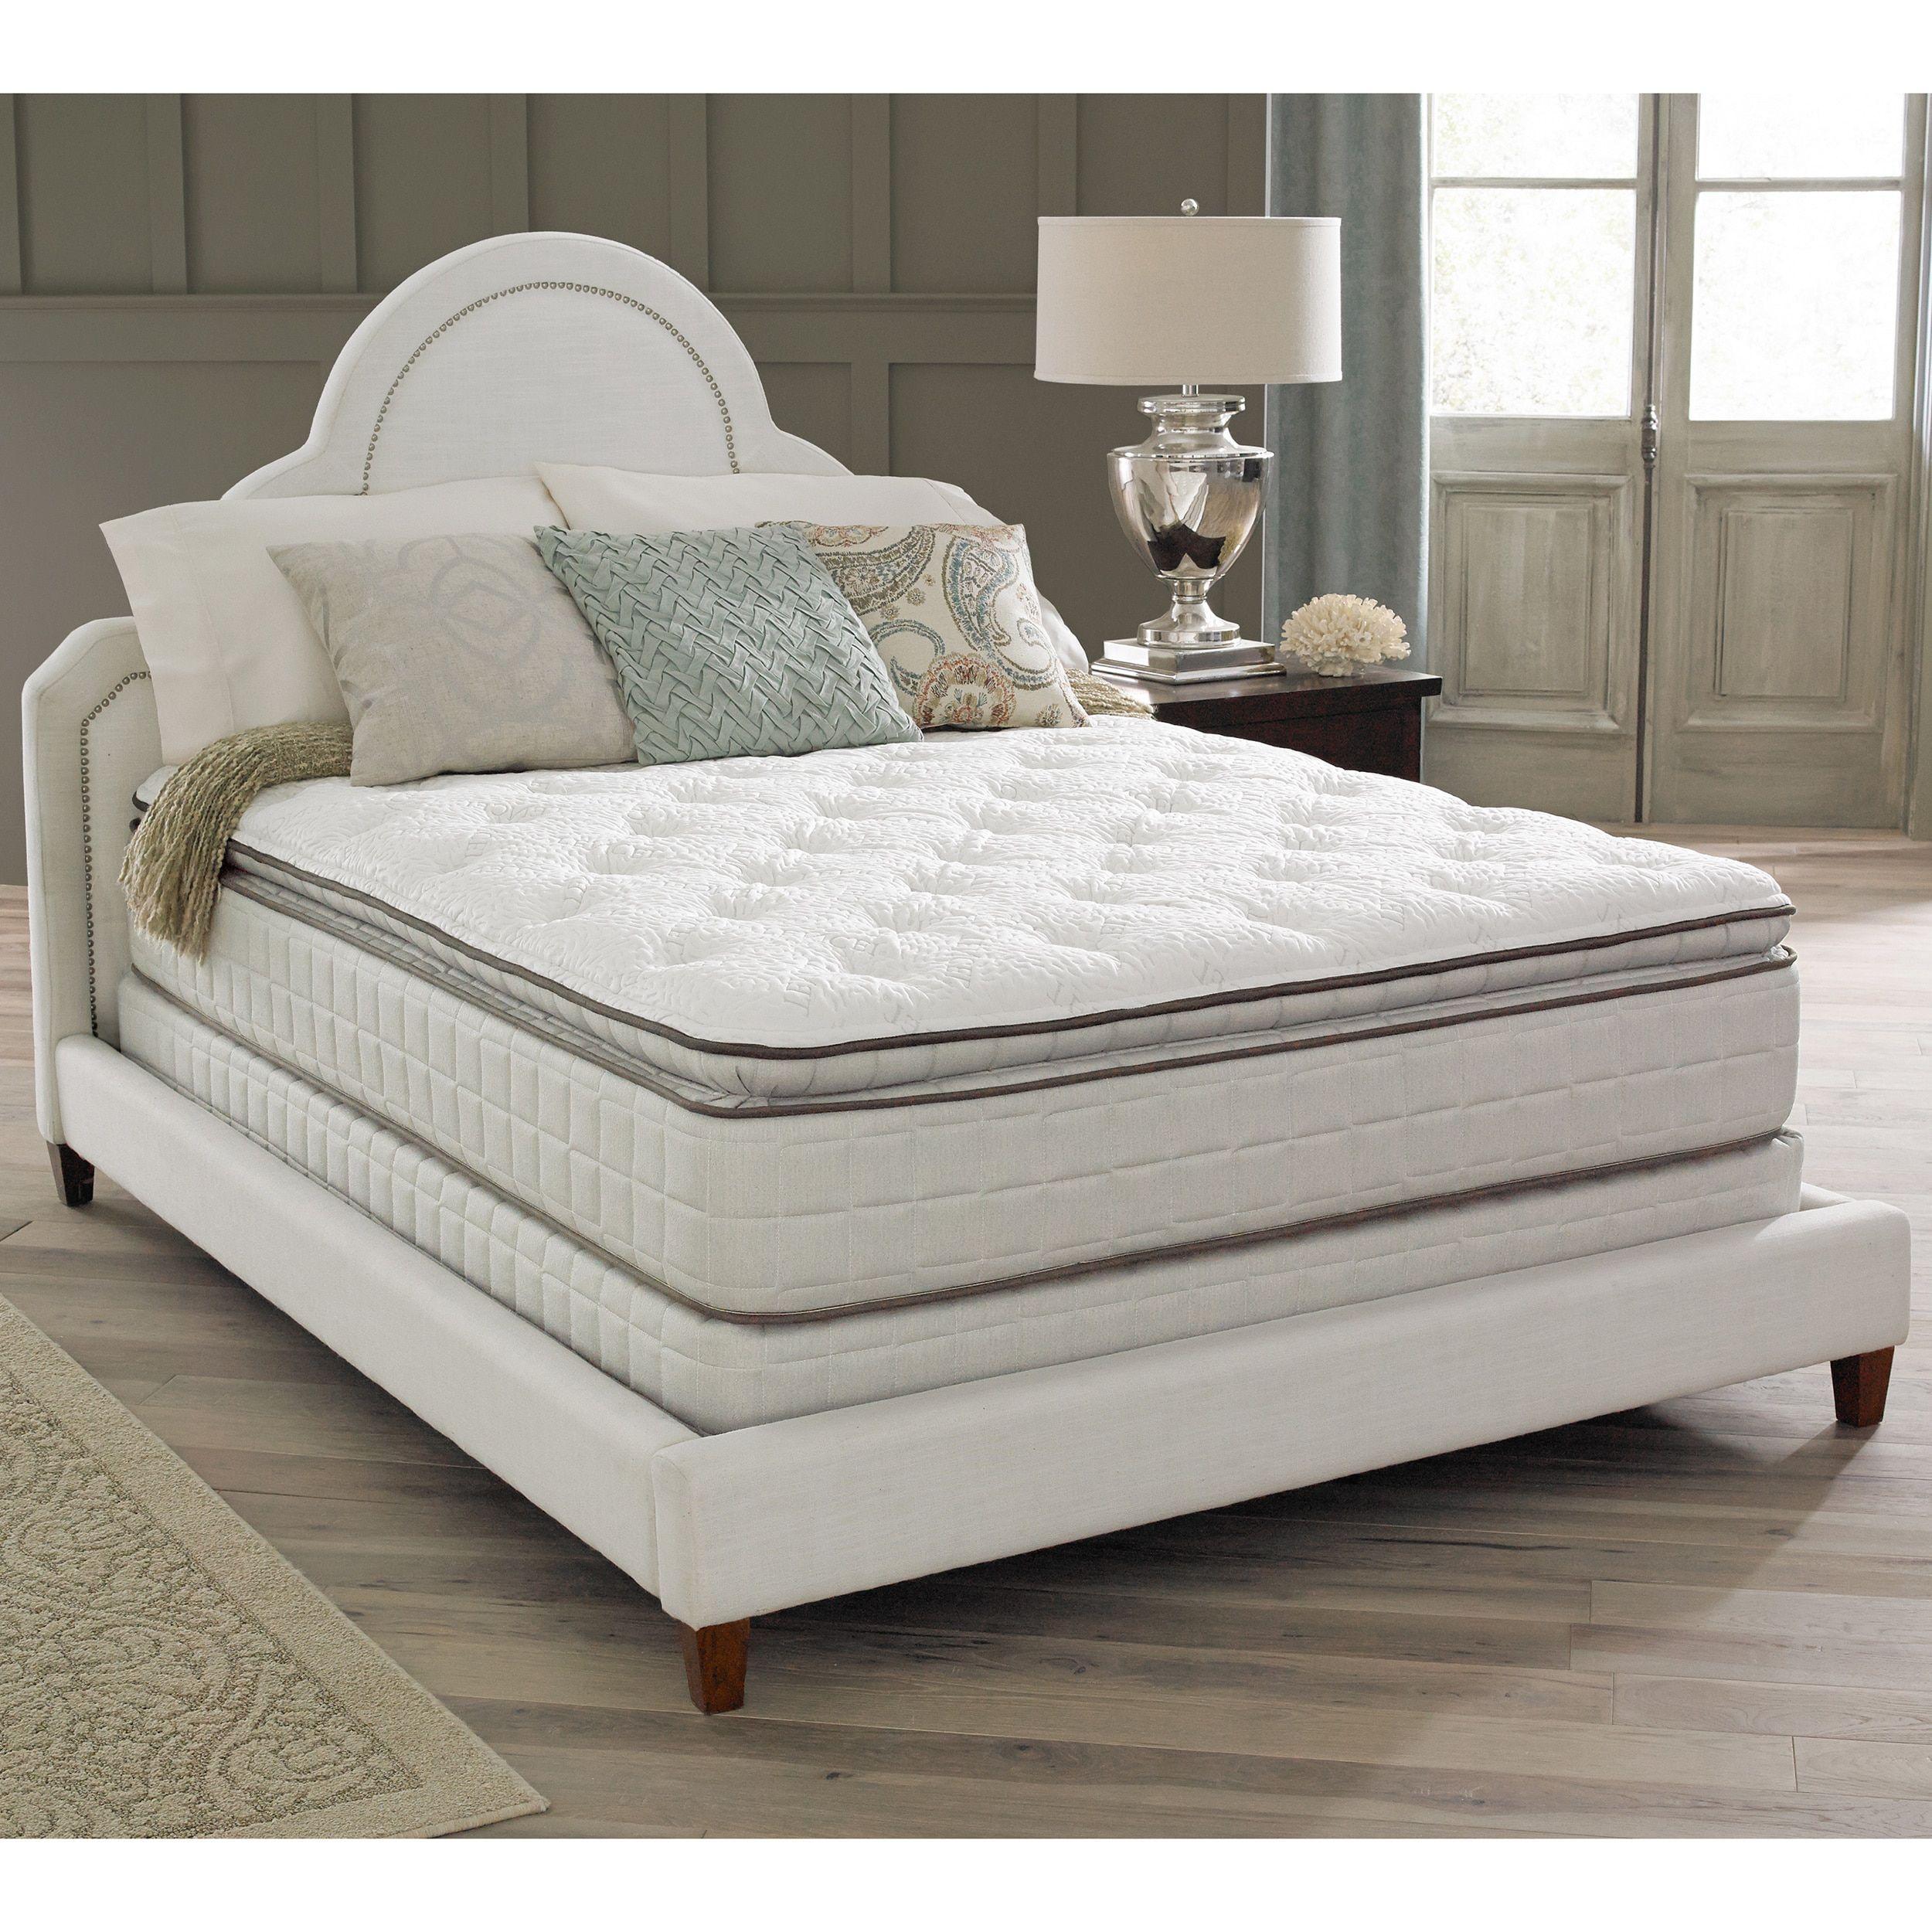 gel inch furniture rc s luxury size willey memory view rcwilley mattress foam mattresses king store jordan jsp